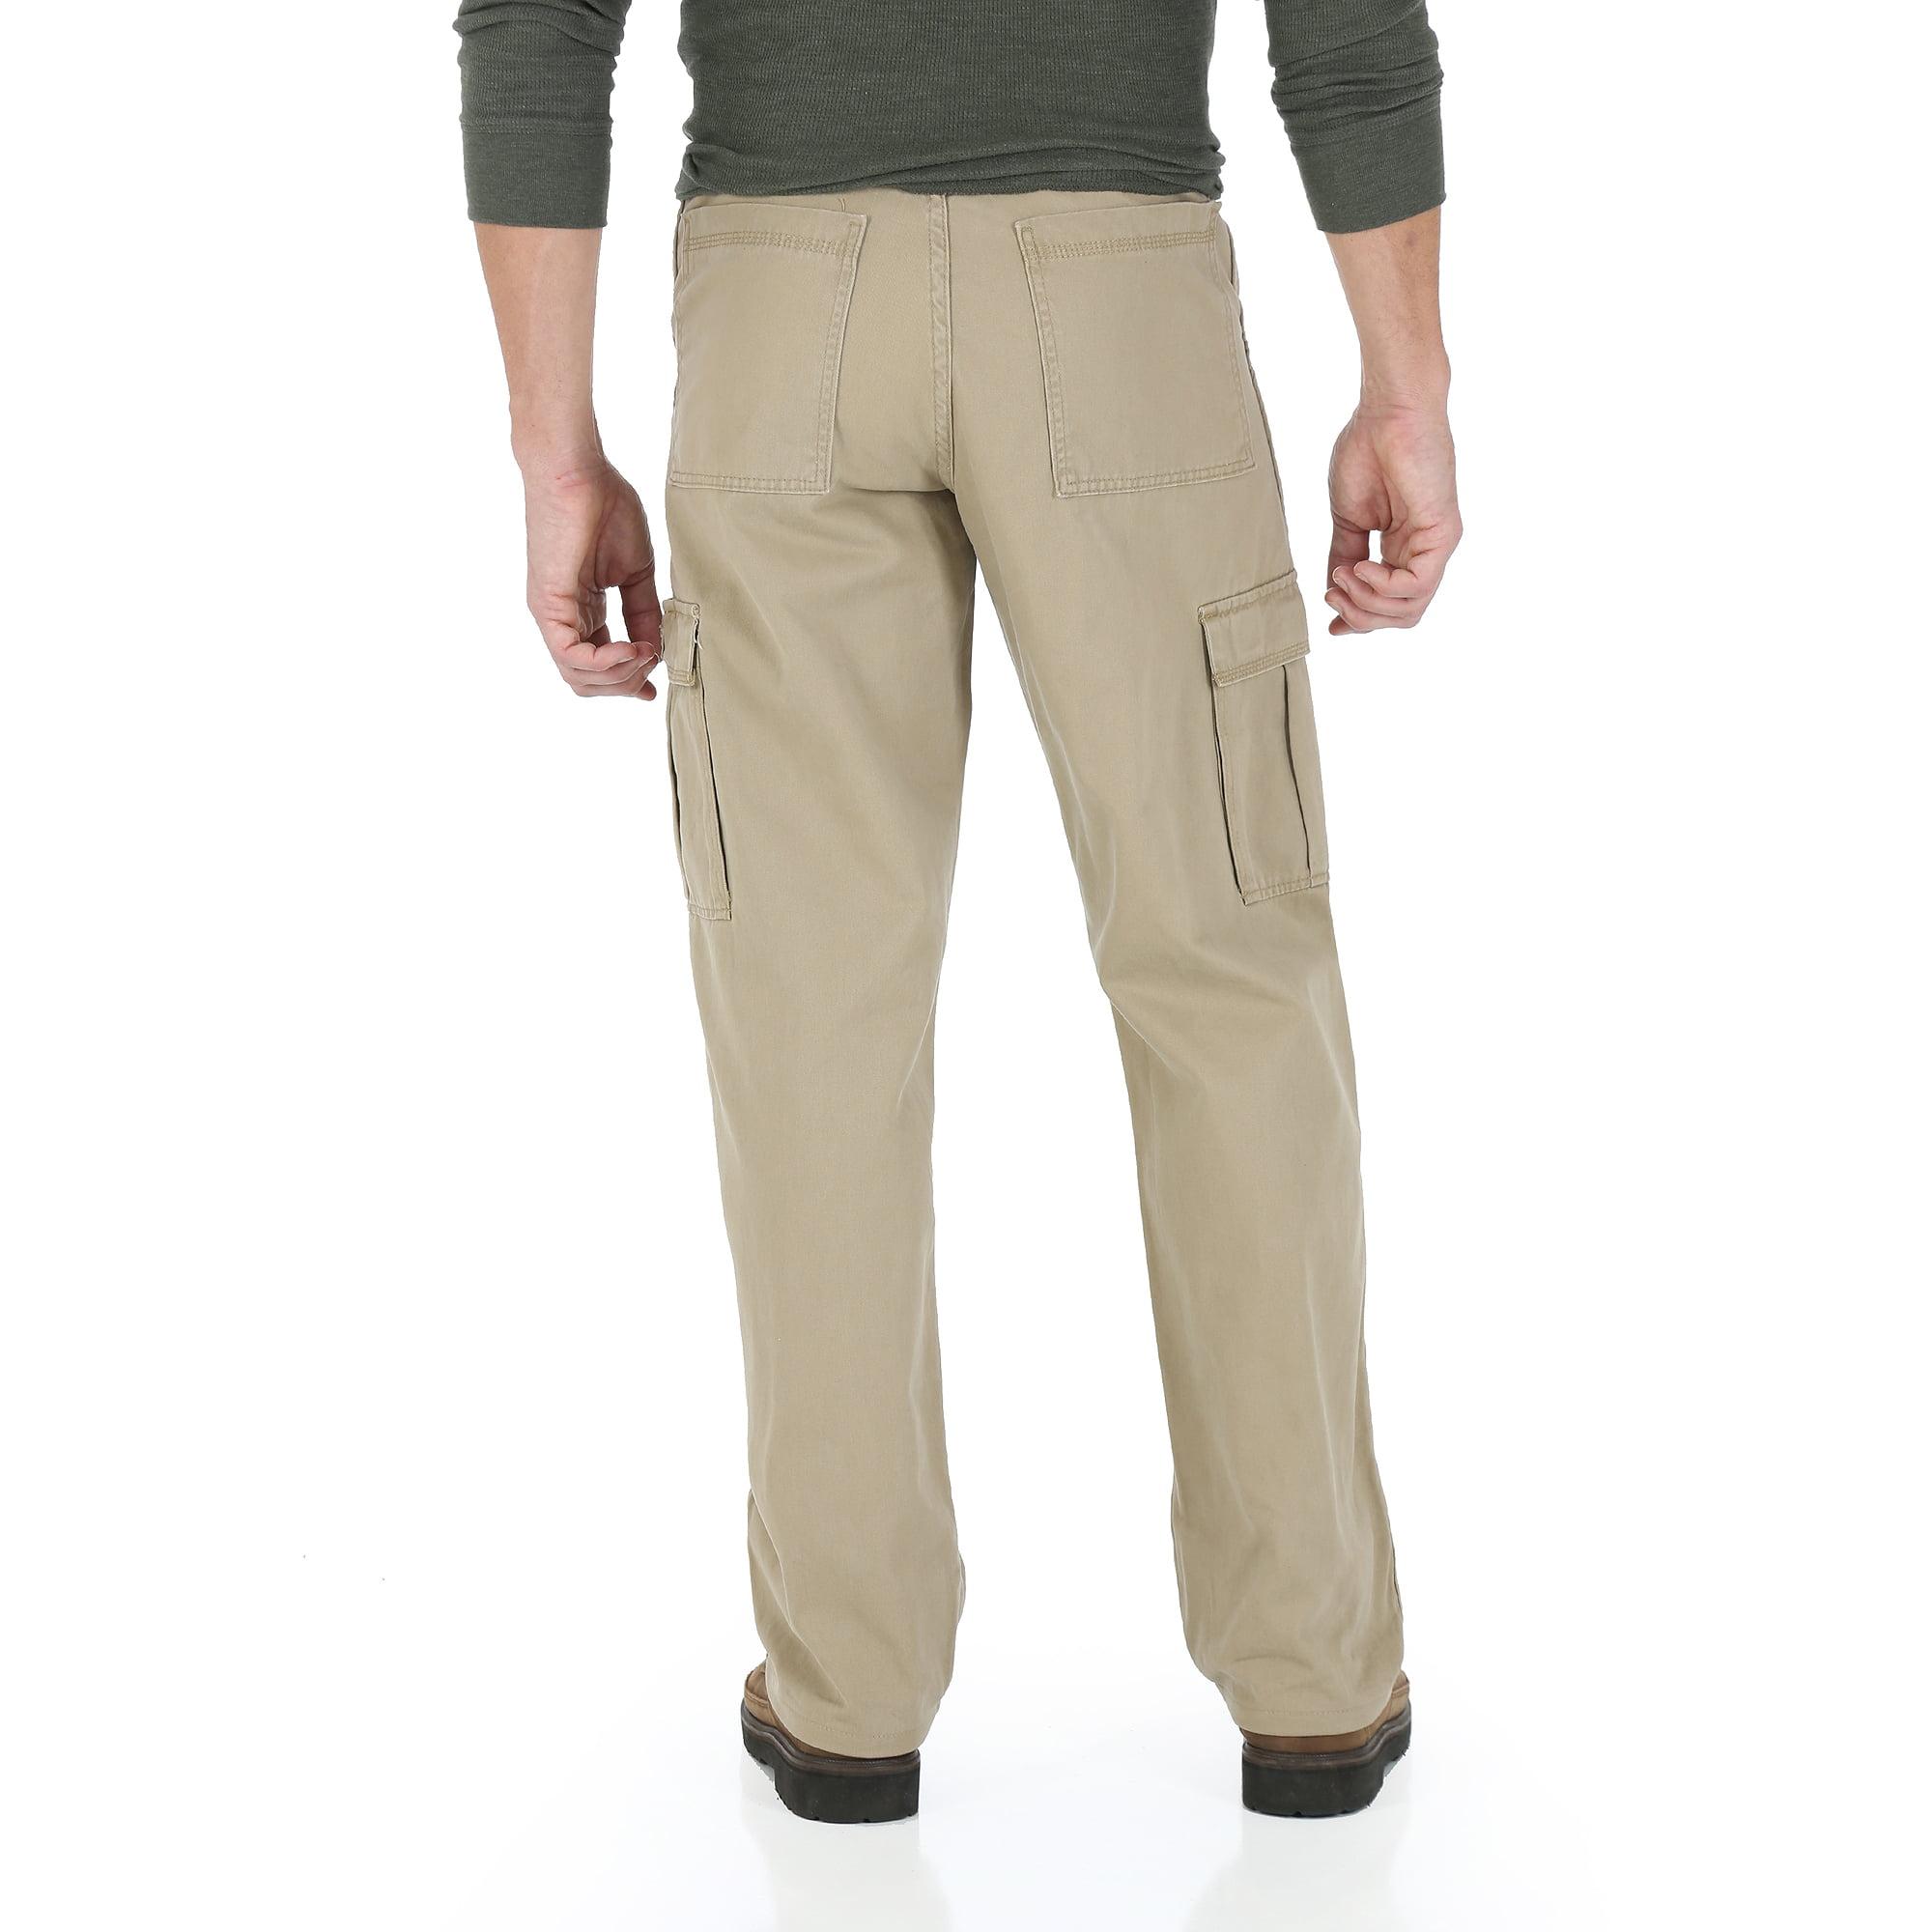 Wrangler - Men's Legacy Cargo Pants - Walmart.com